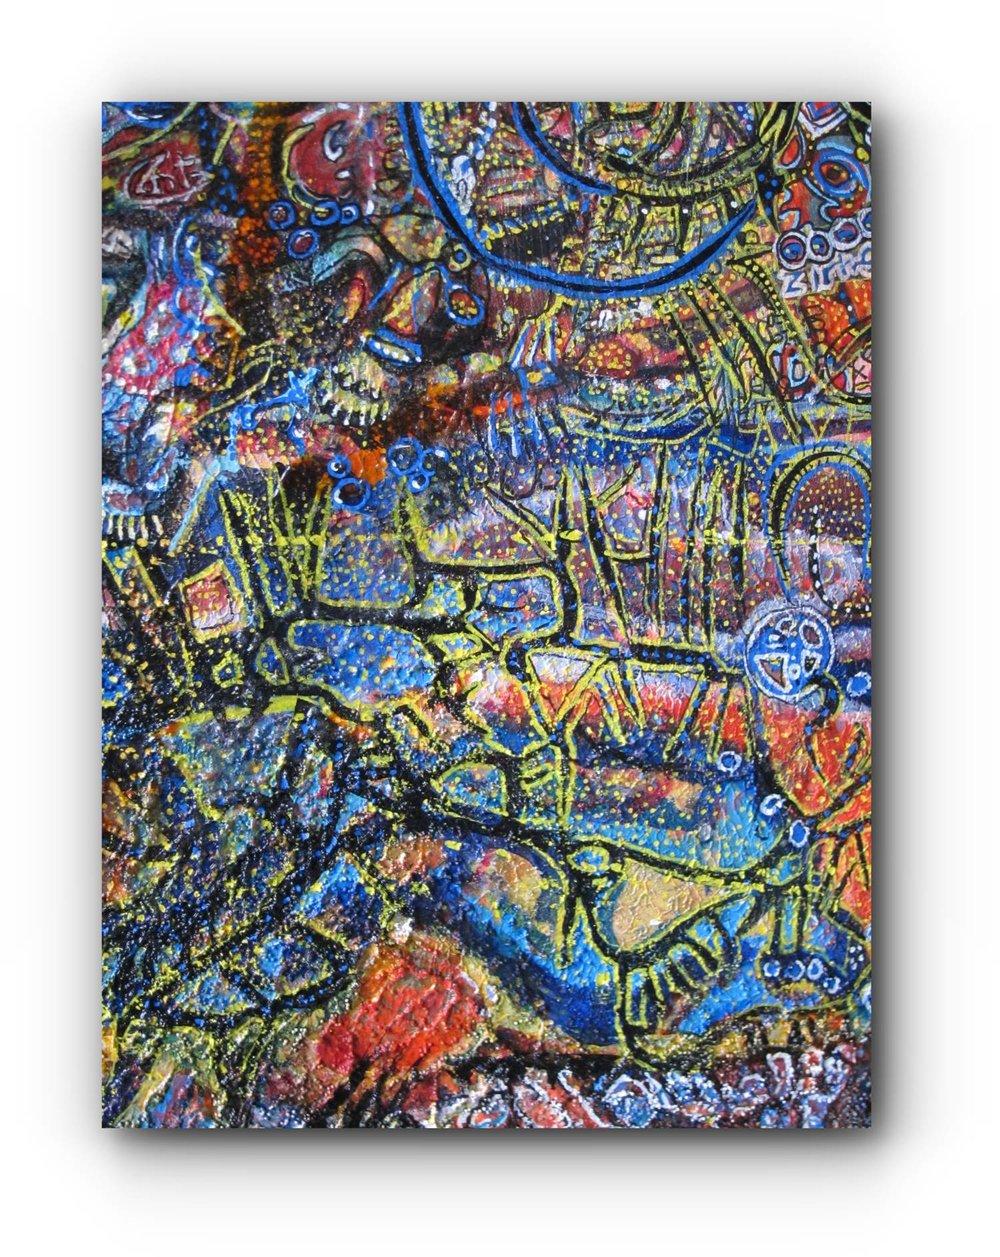 painting-detail-2-wisdom-trout-artists-ingress-vortices.jpg